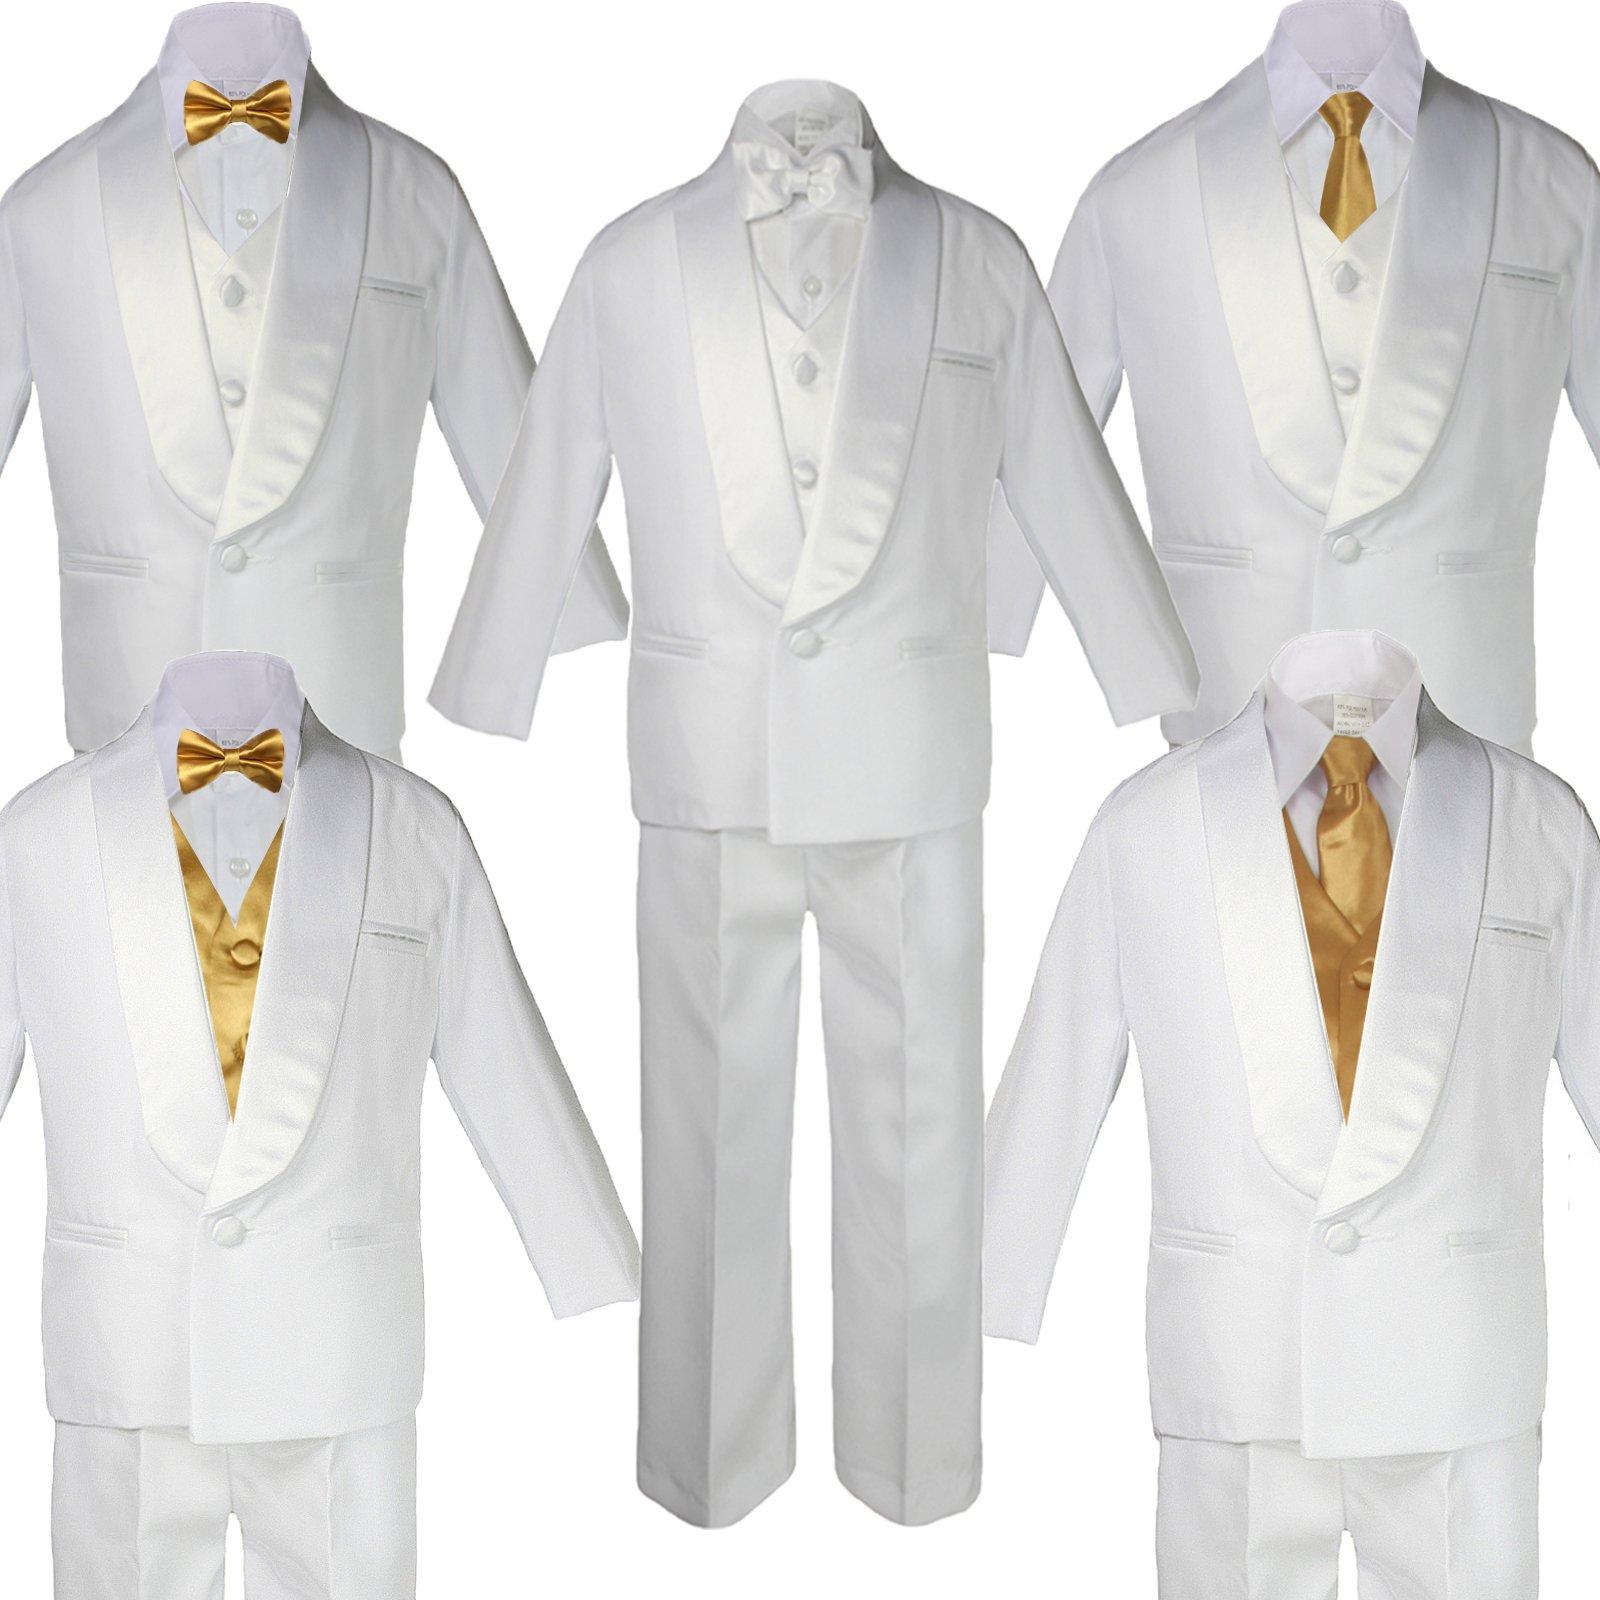 7pc Formal Boys Dark Gray Suits Extra Eggplant Vest Necktie Sets S-20 Medim: 6-12 months